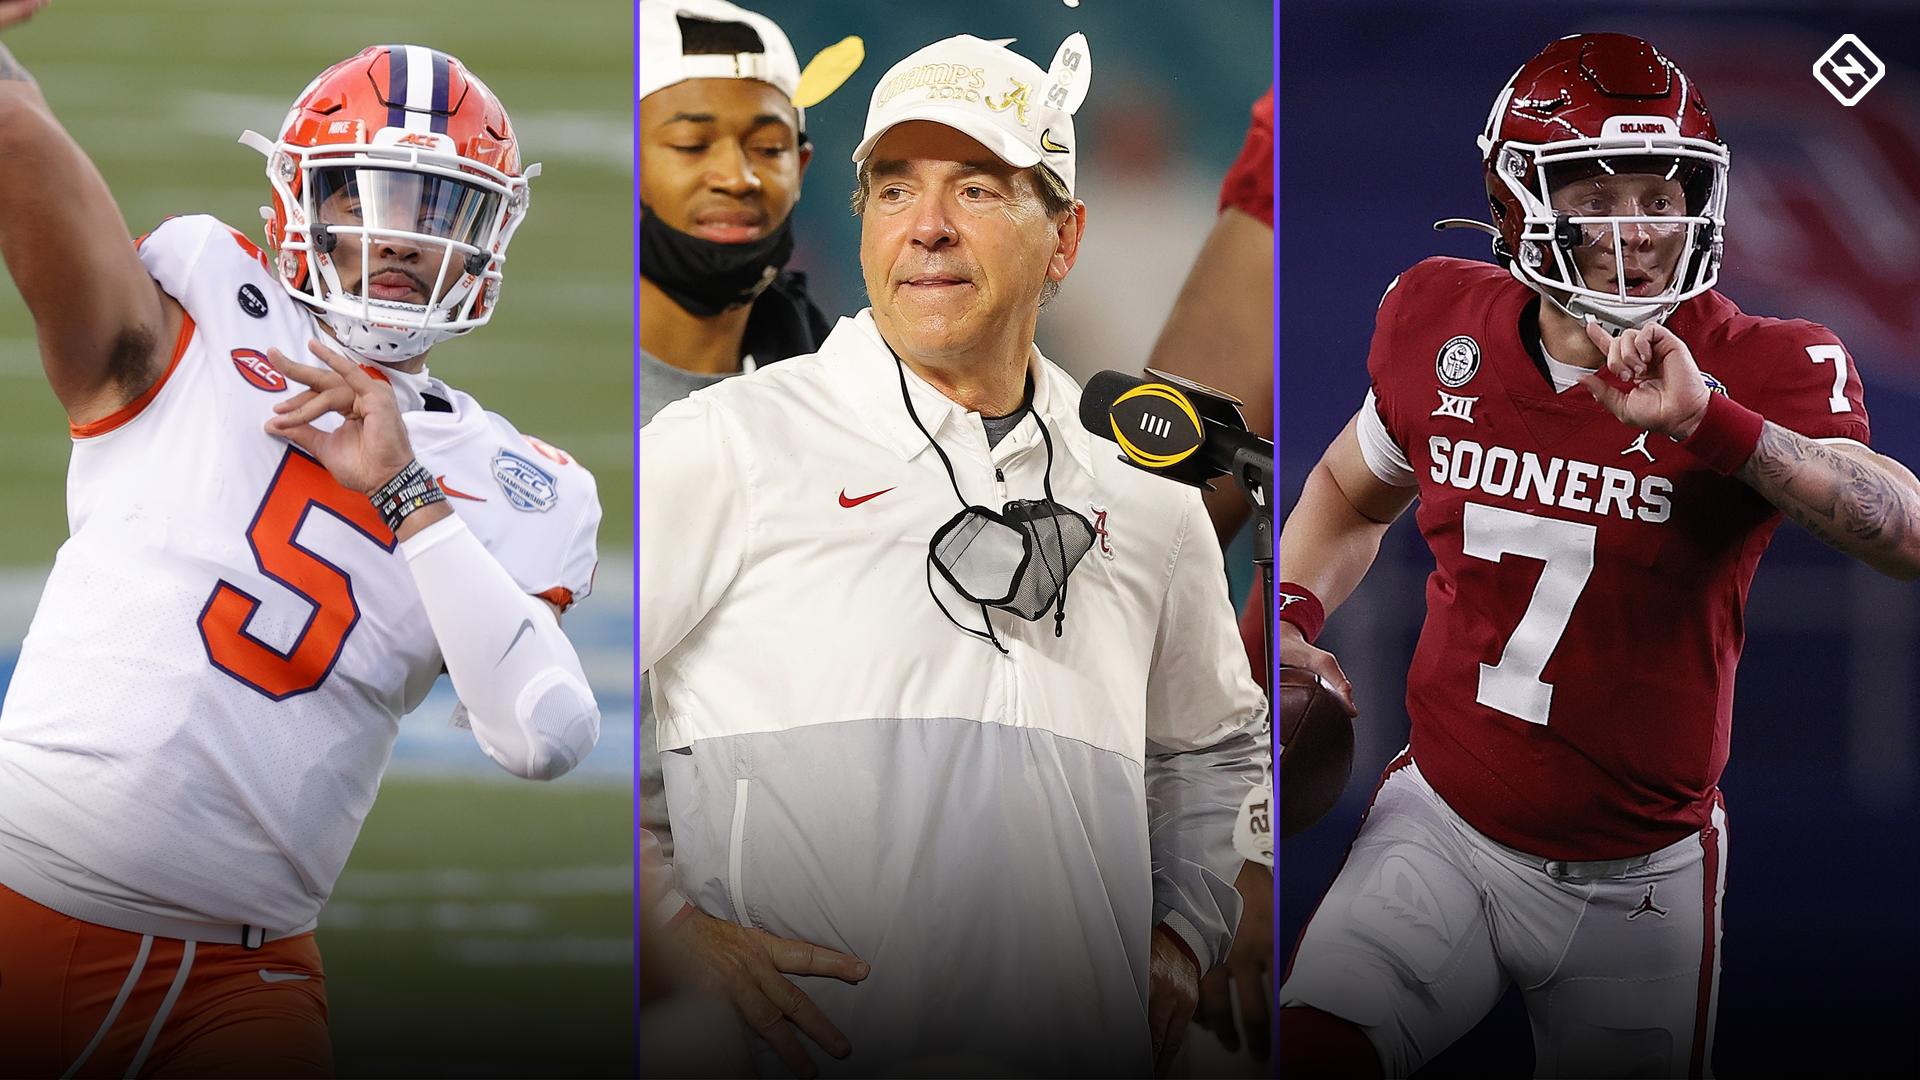 College football rankings: Alabama, Clemson, Ohio State lead Sporting News' preseason top 25